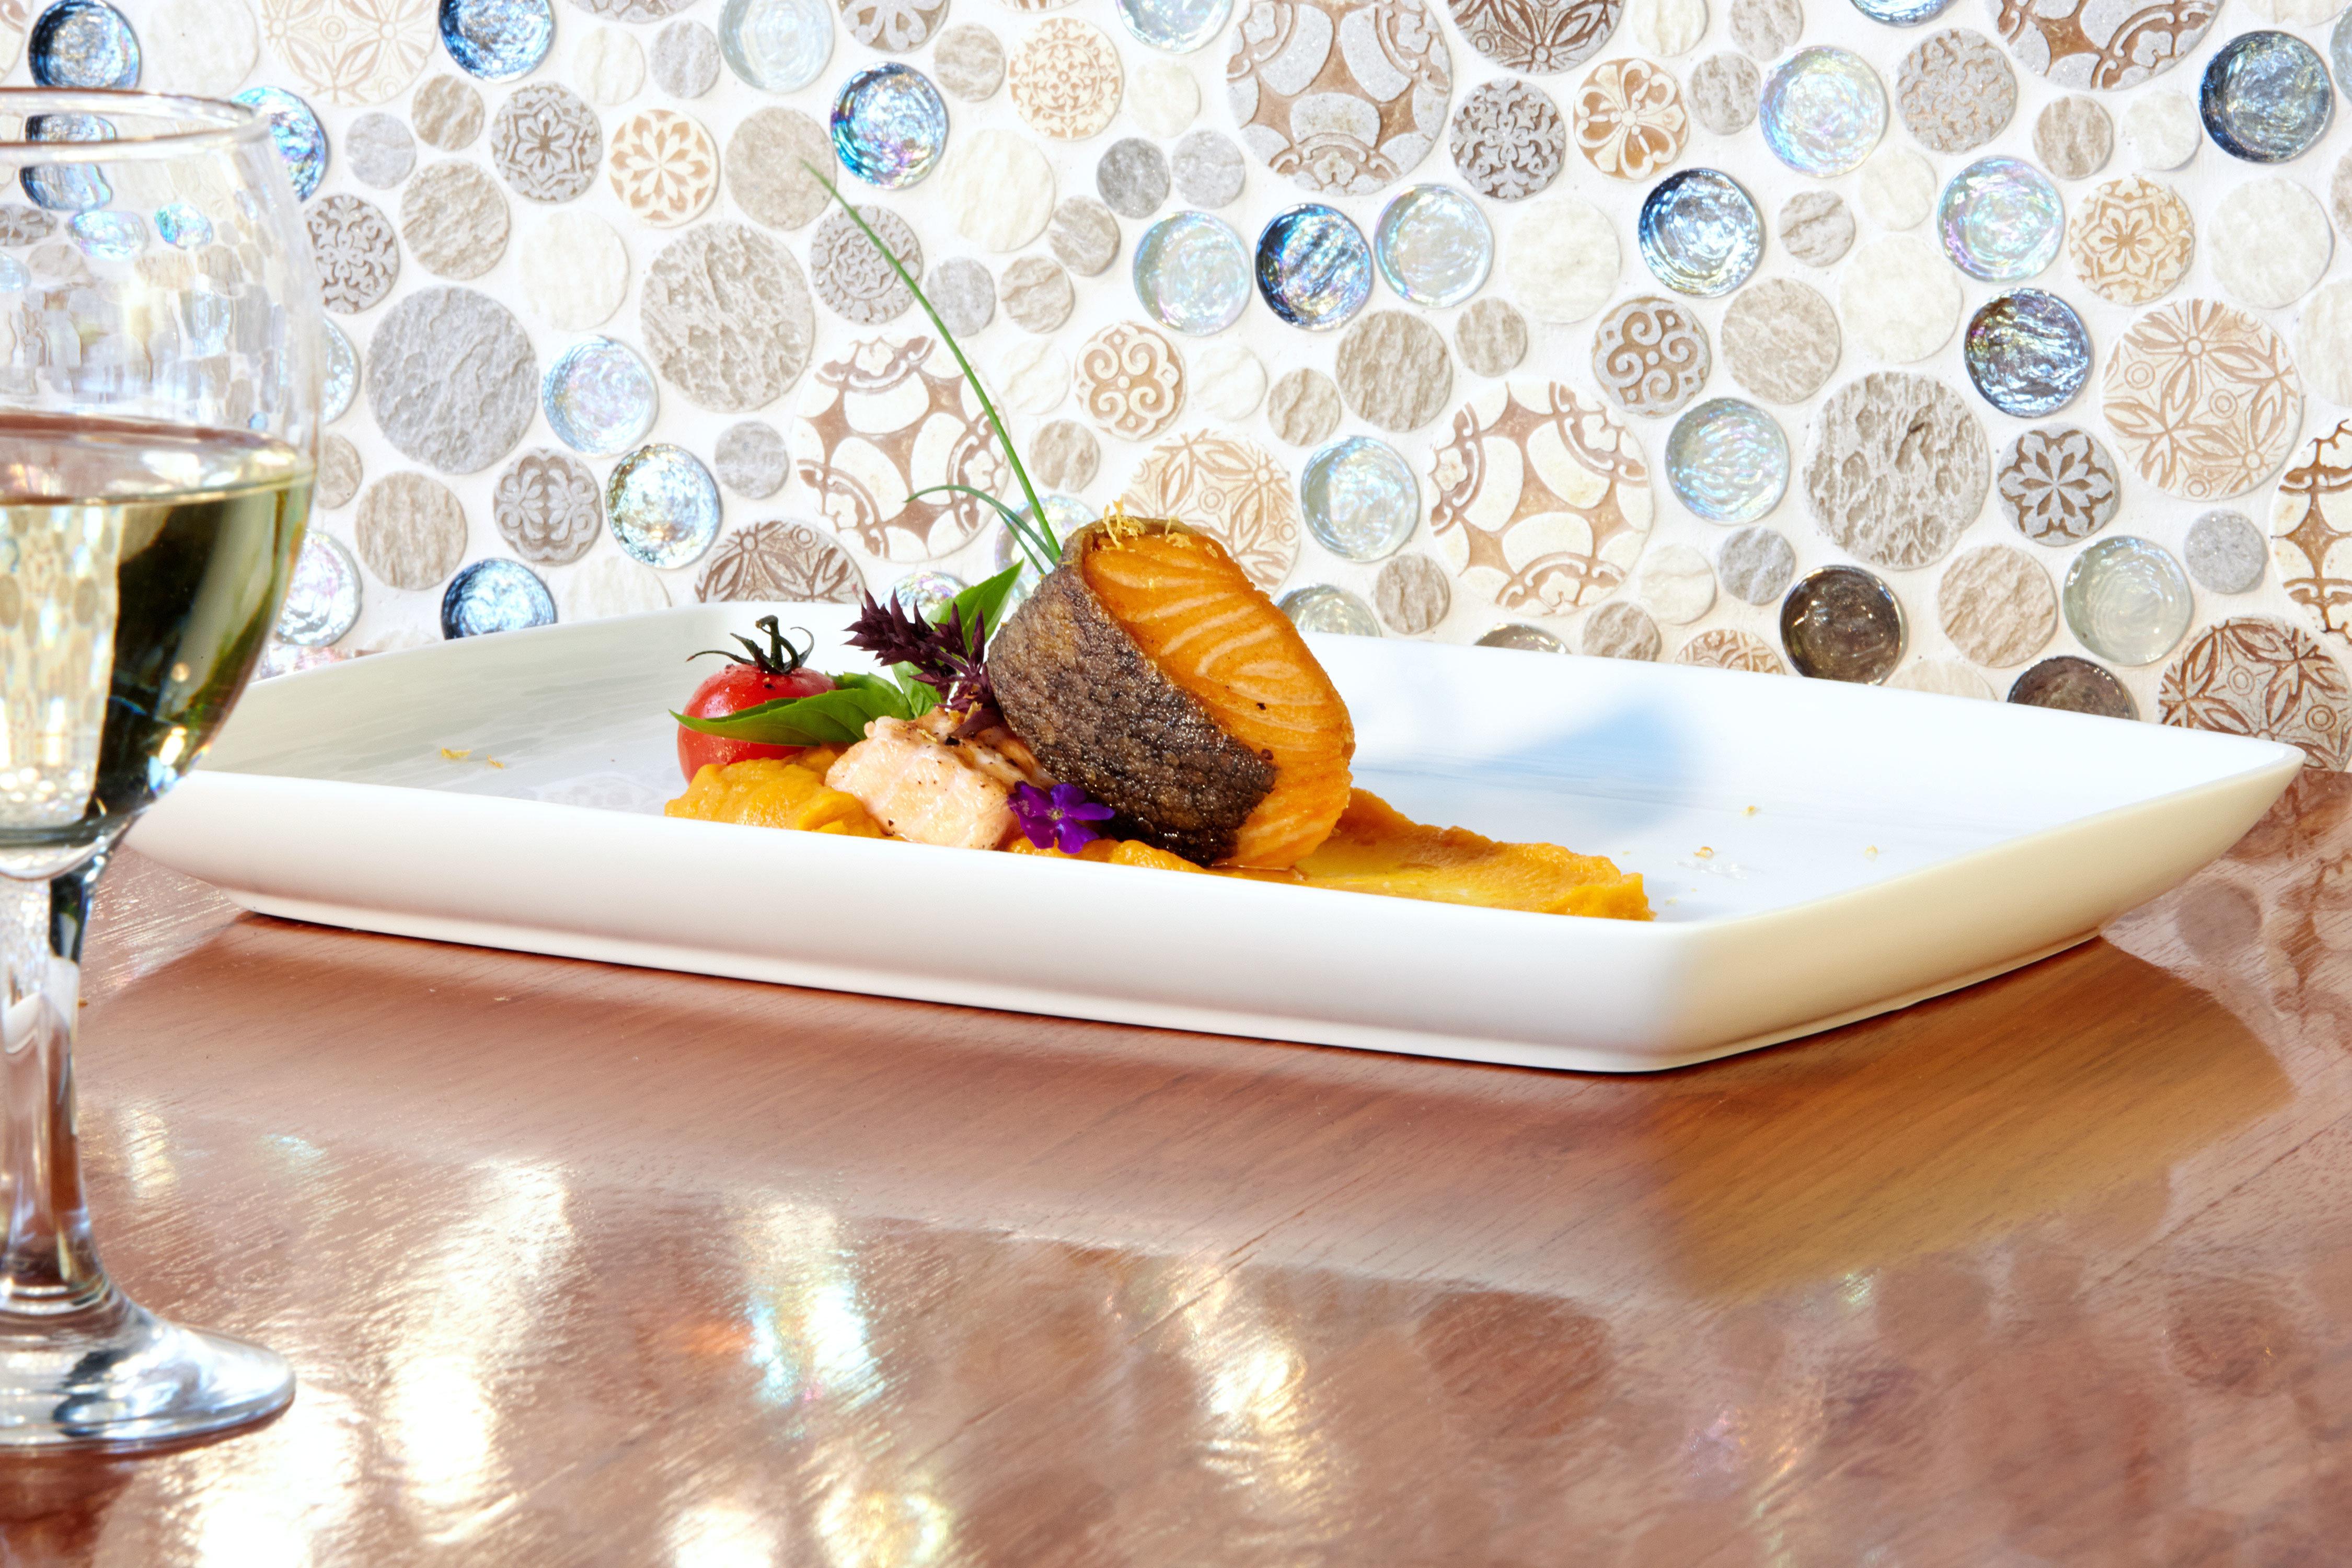 Bar Dining Drink Eat Luxury Tropical plate bathtub glass